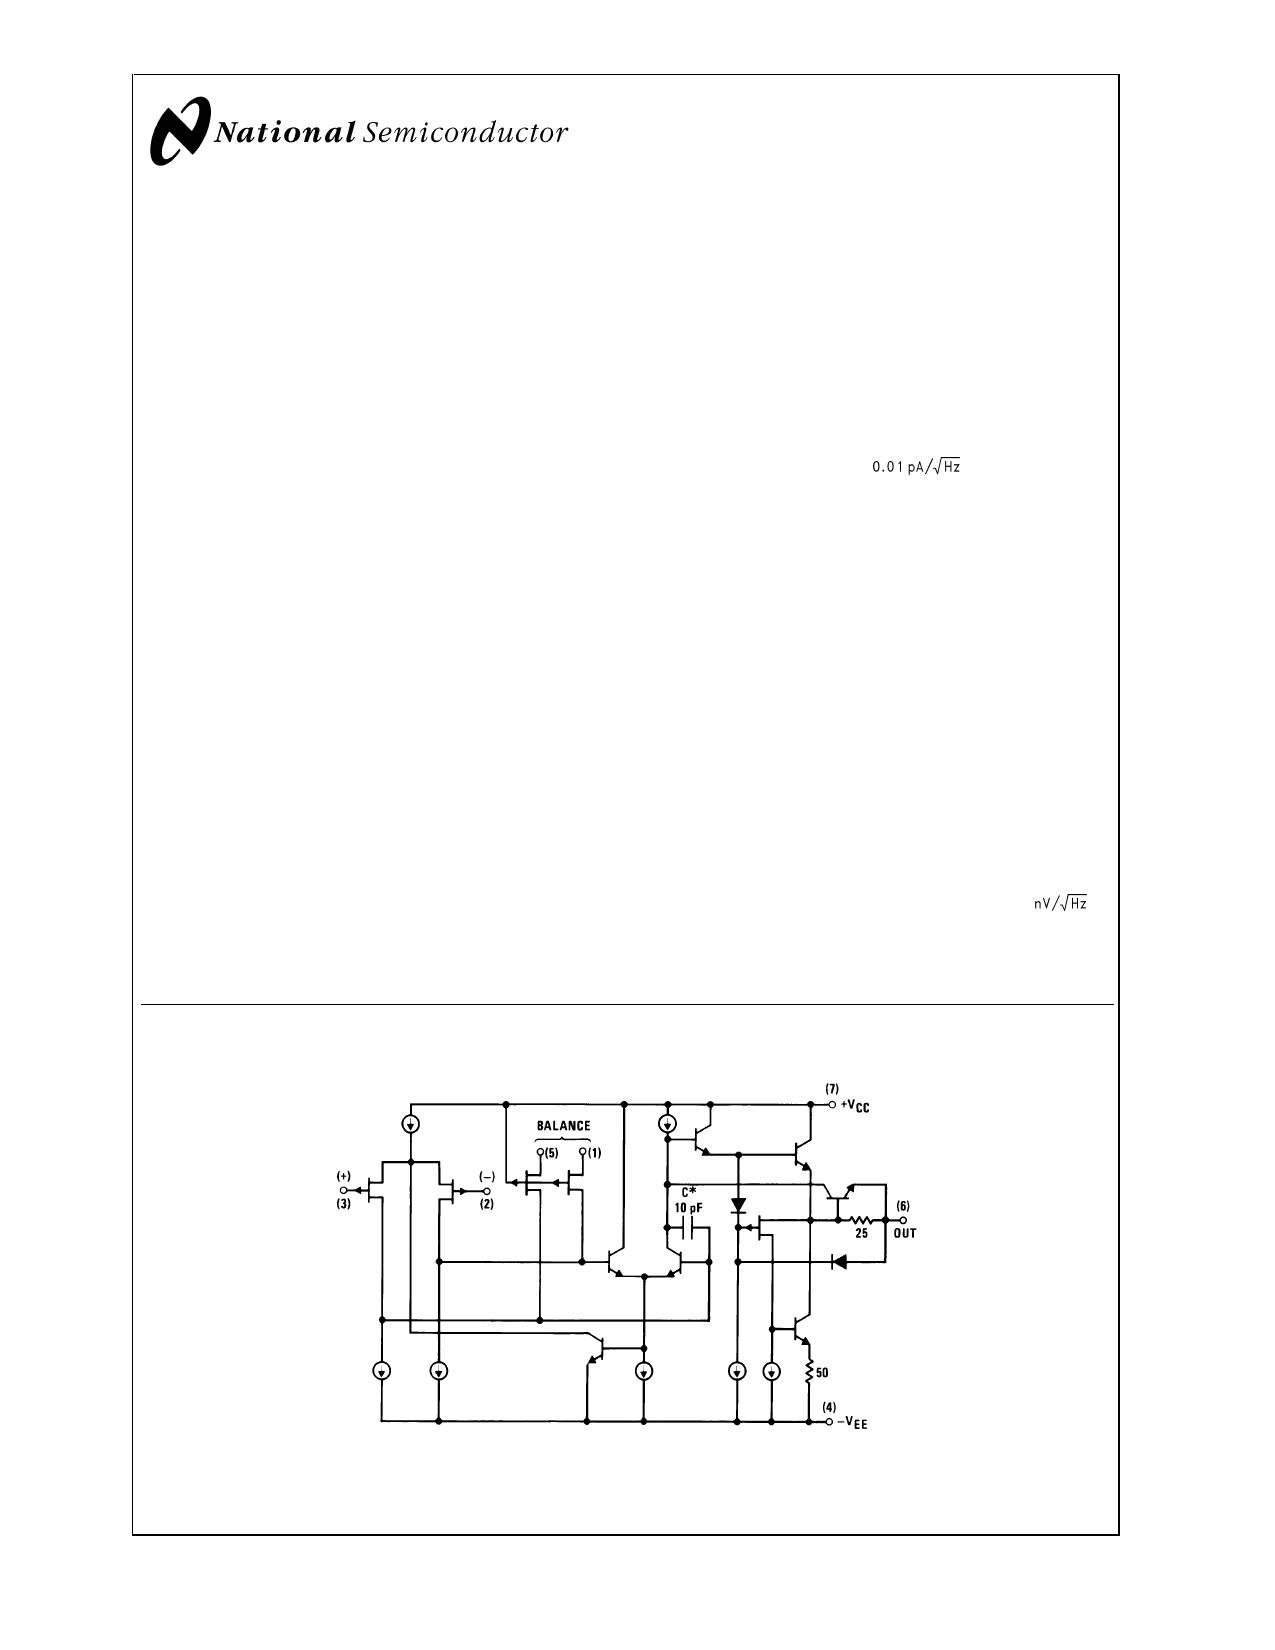 LF257 데이터시트 및 LF257 PDF